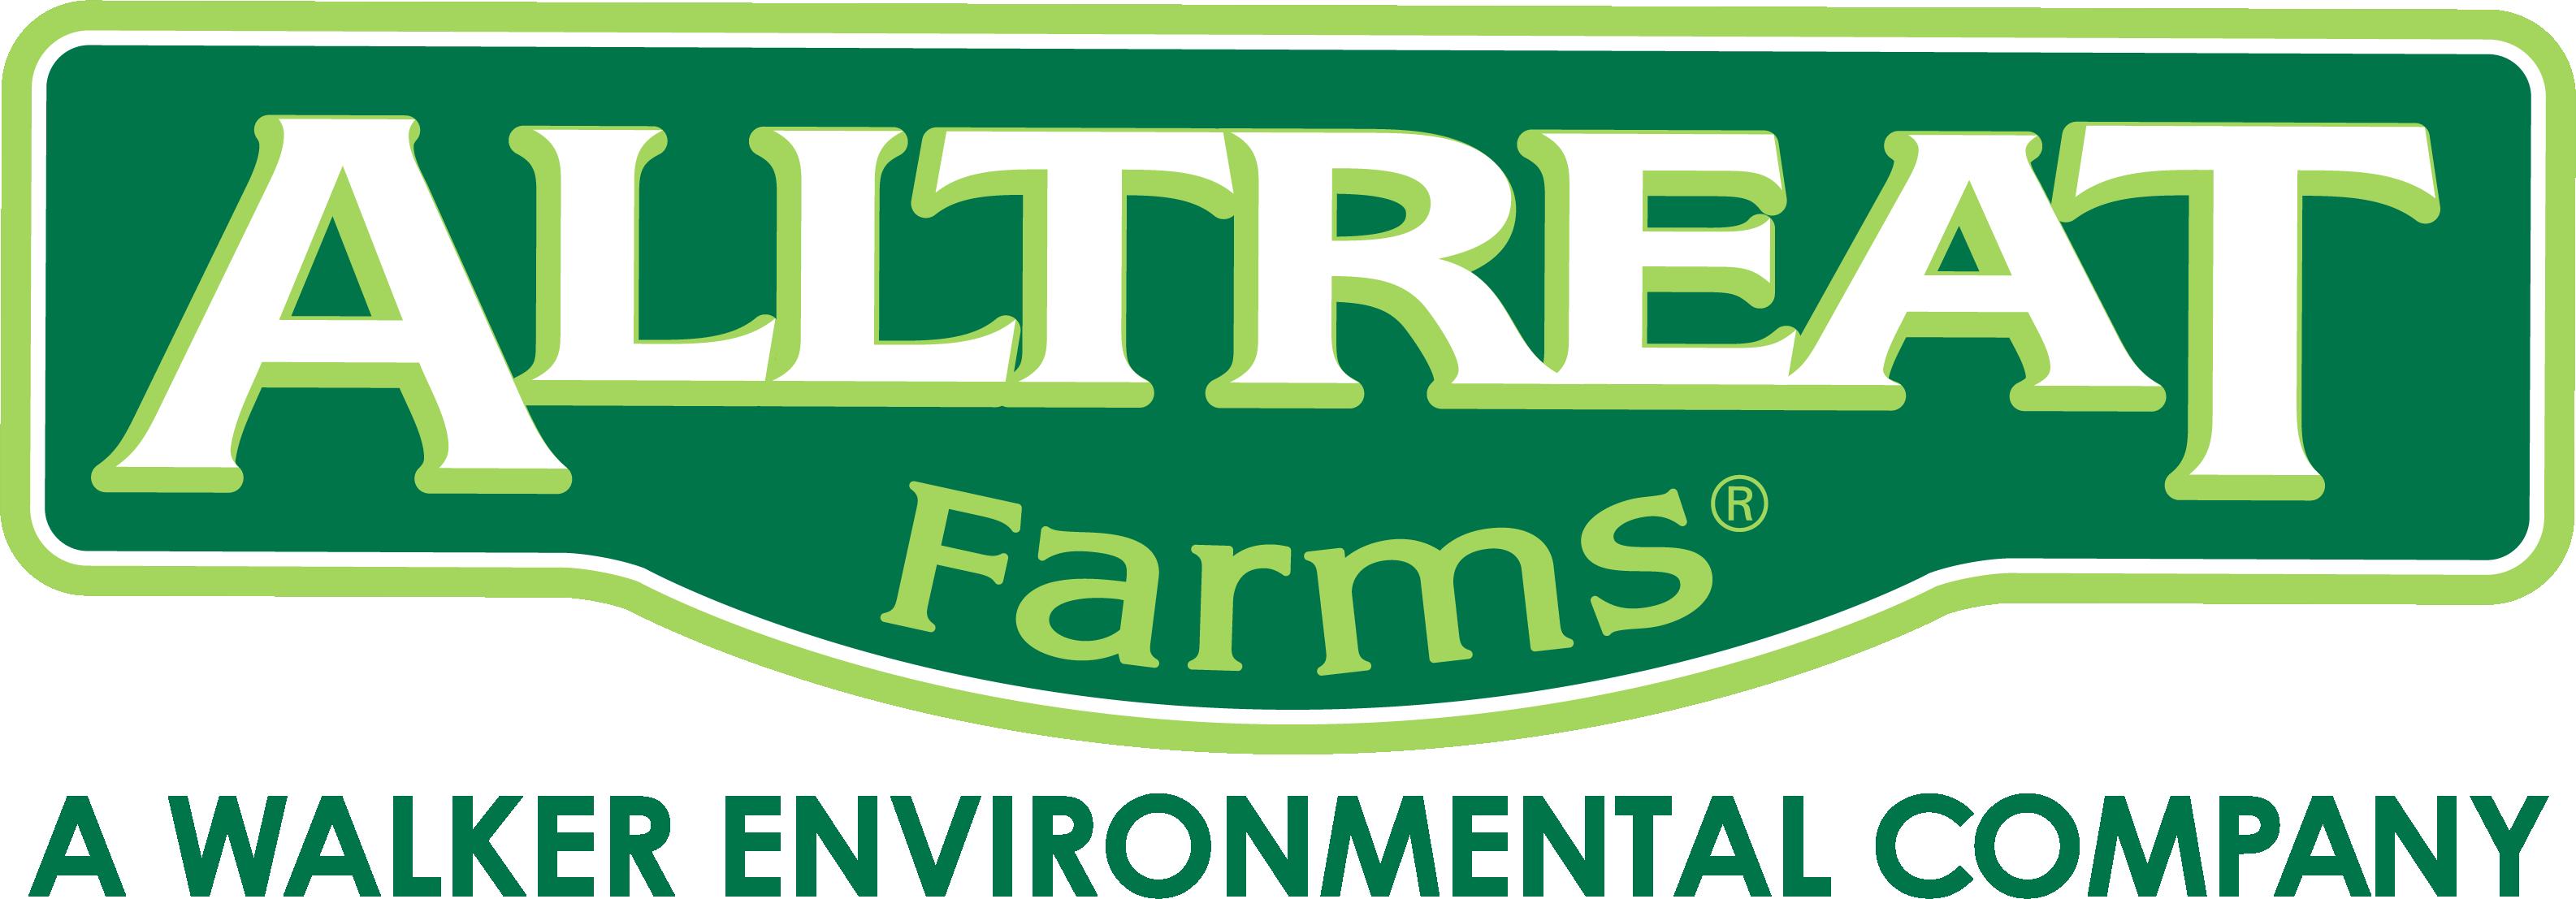 All Treat Farms